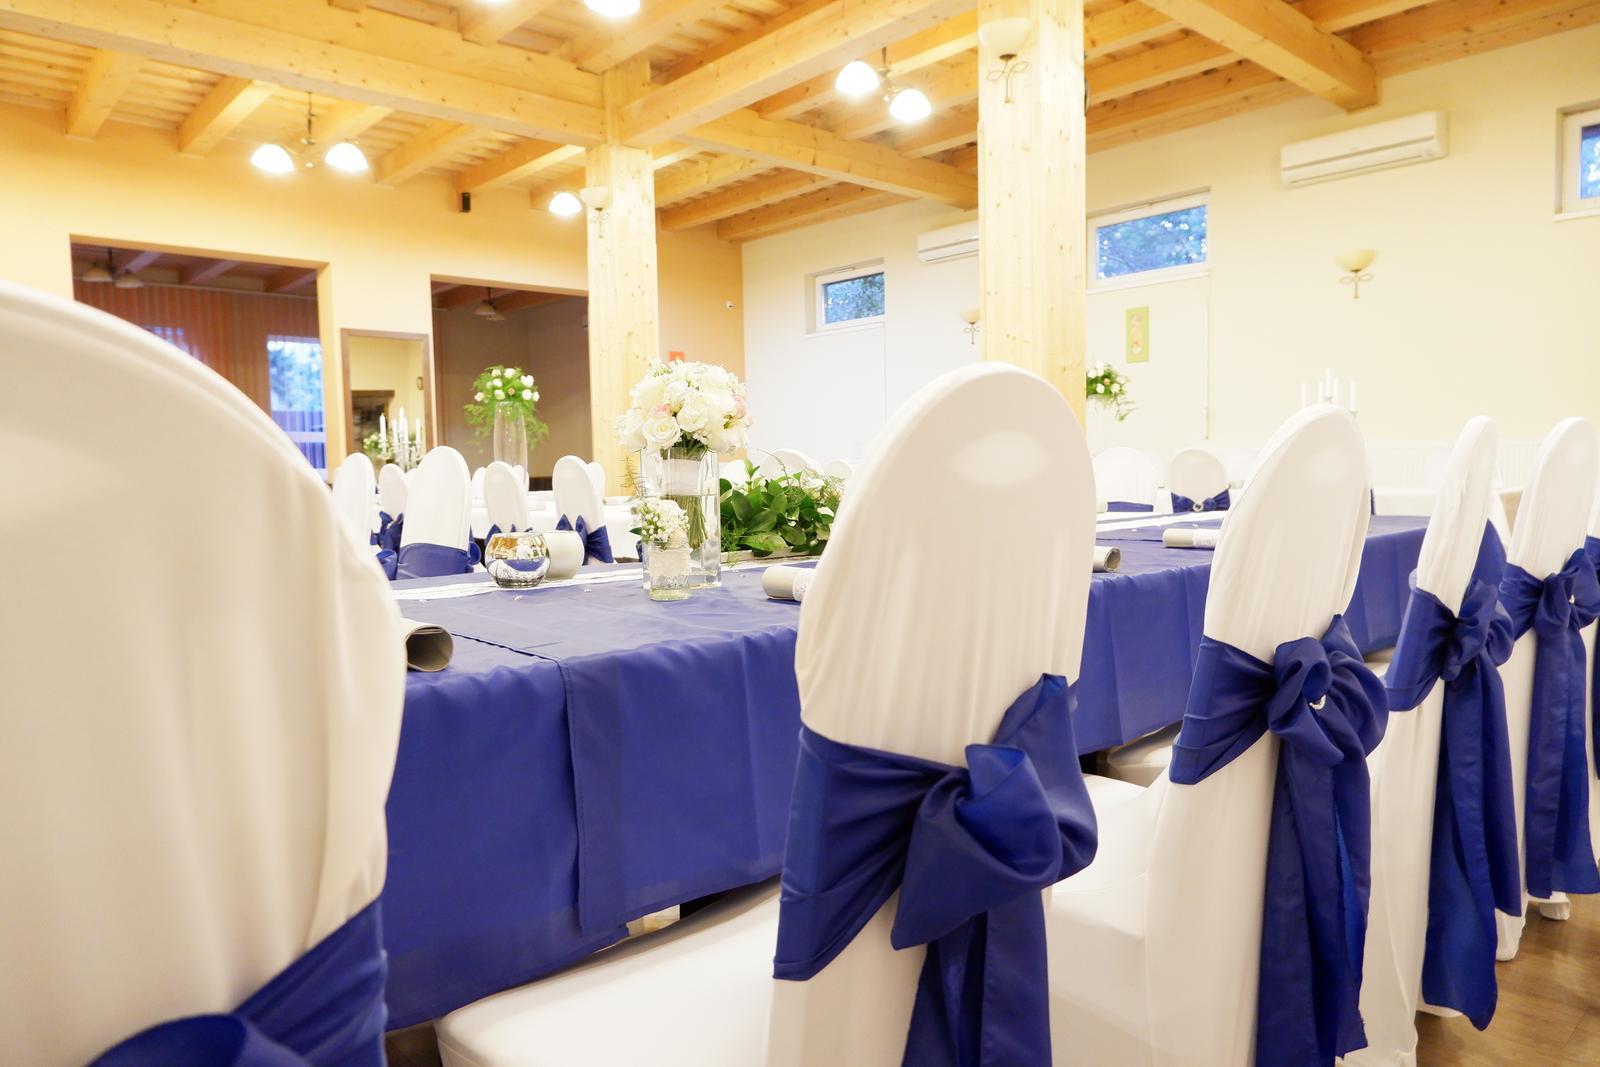 mašľa na stoličku kráľovská modrá - Obrázok č. 2